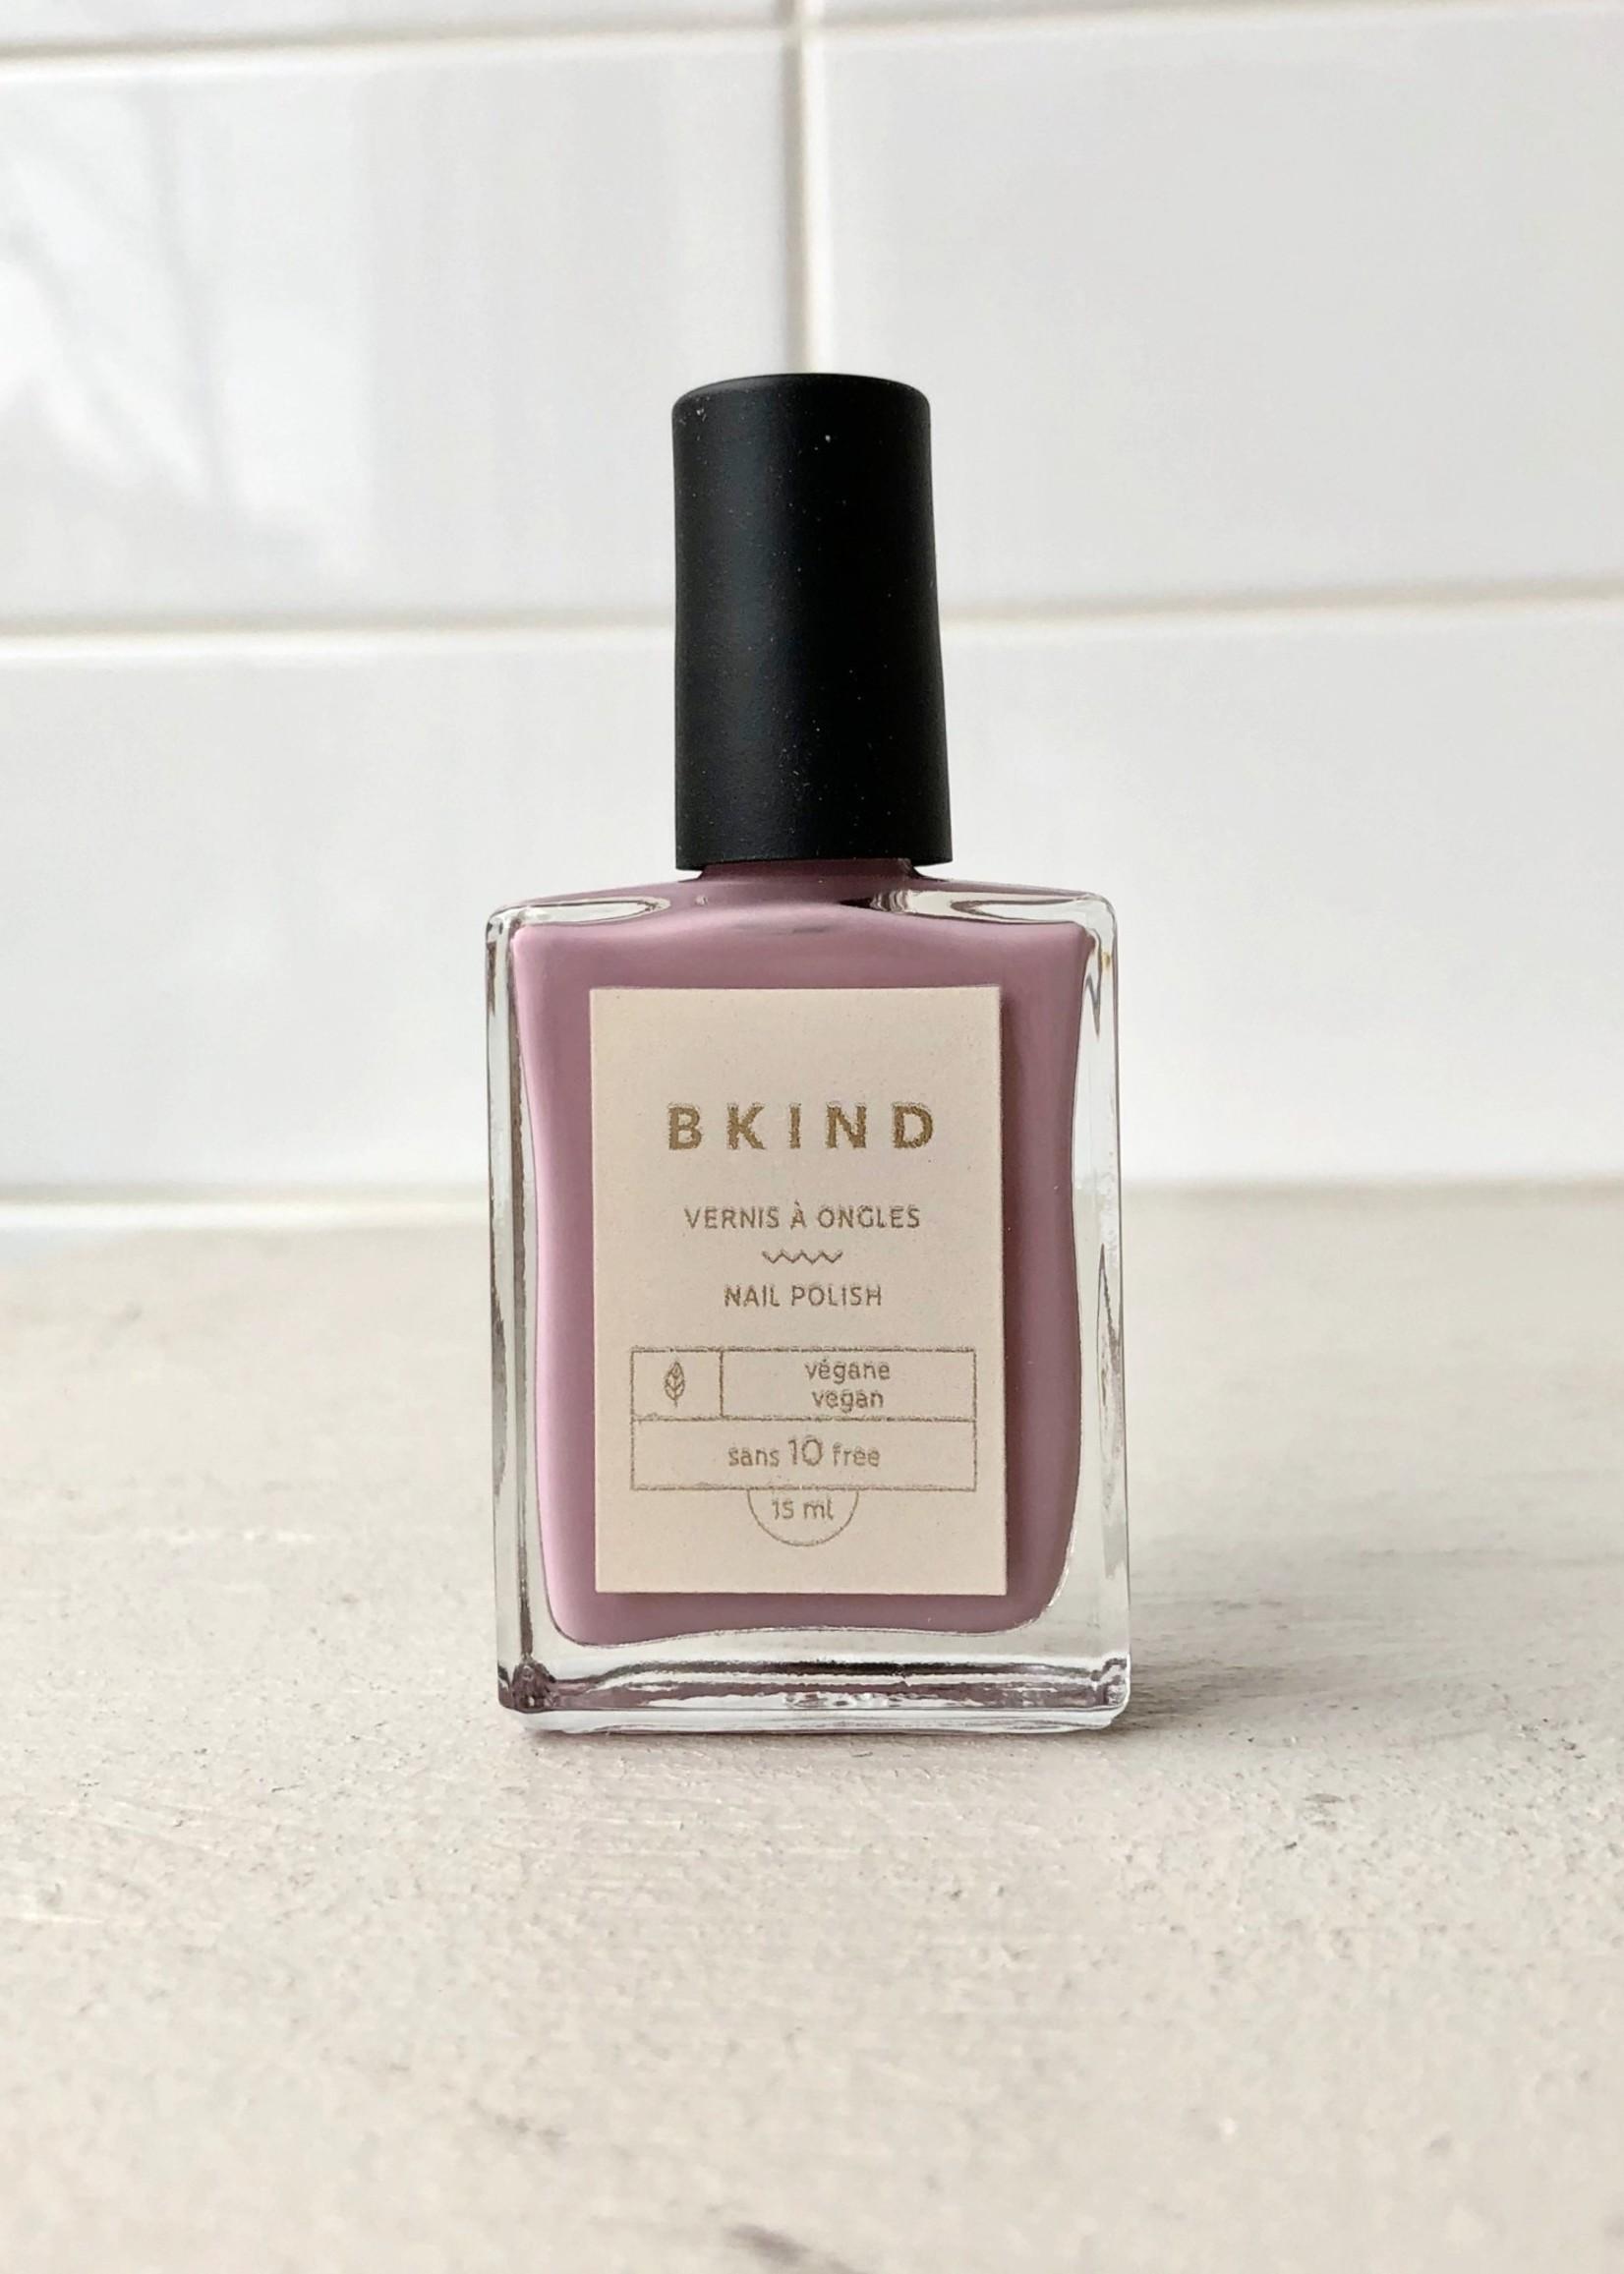 BKIND BKIND Summer Nail Polishes